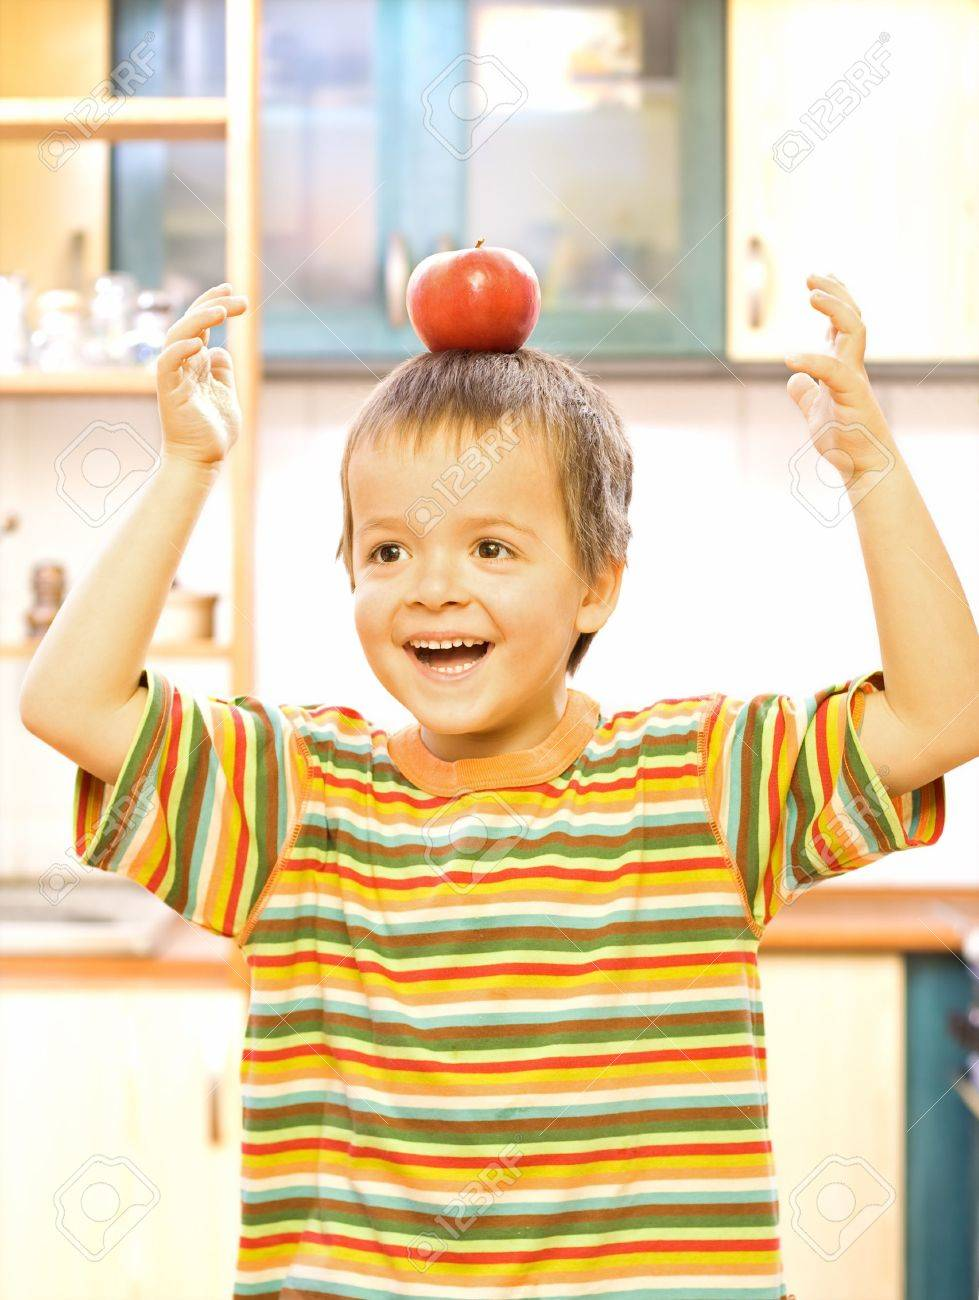 Happy boy with apple - balanced diet concept Stock Photo - 2780378